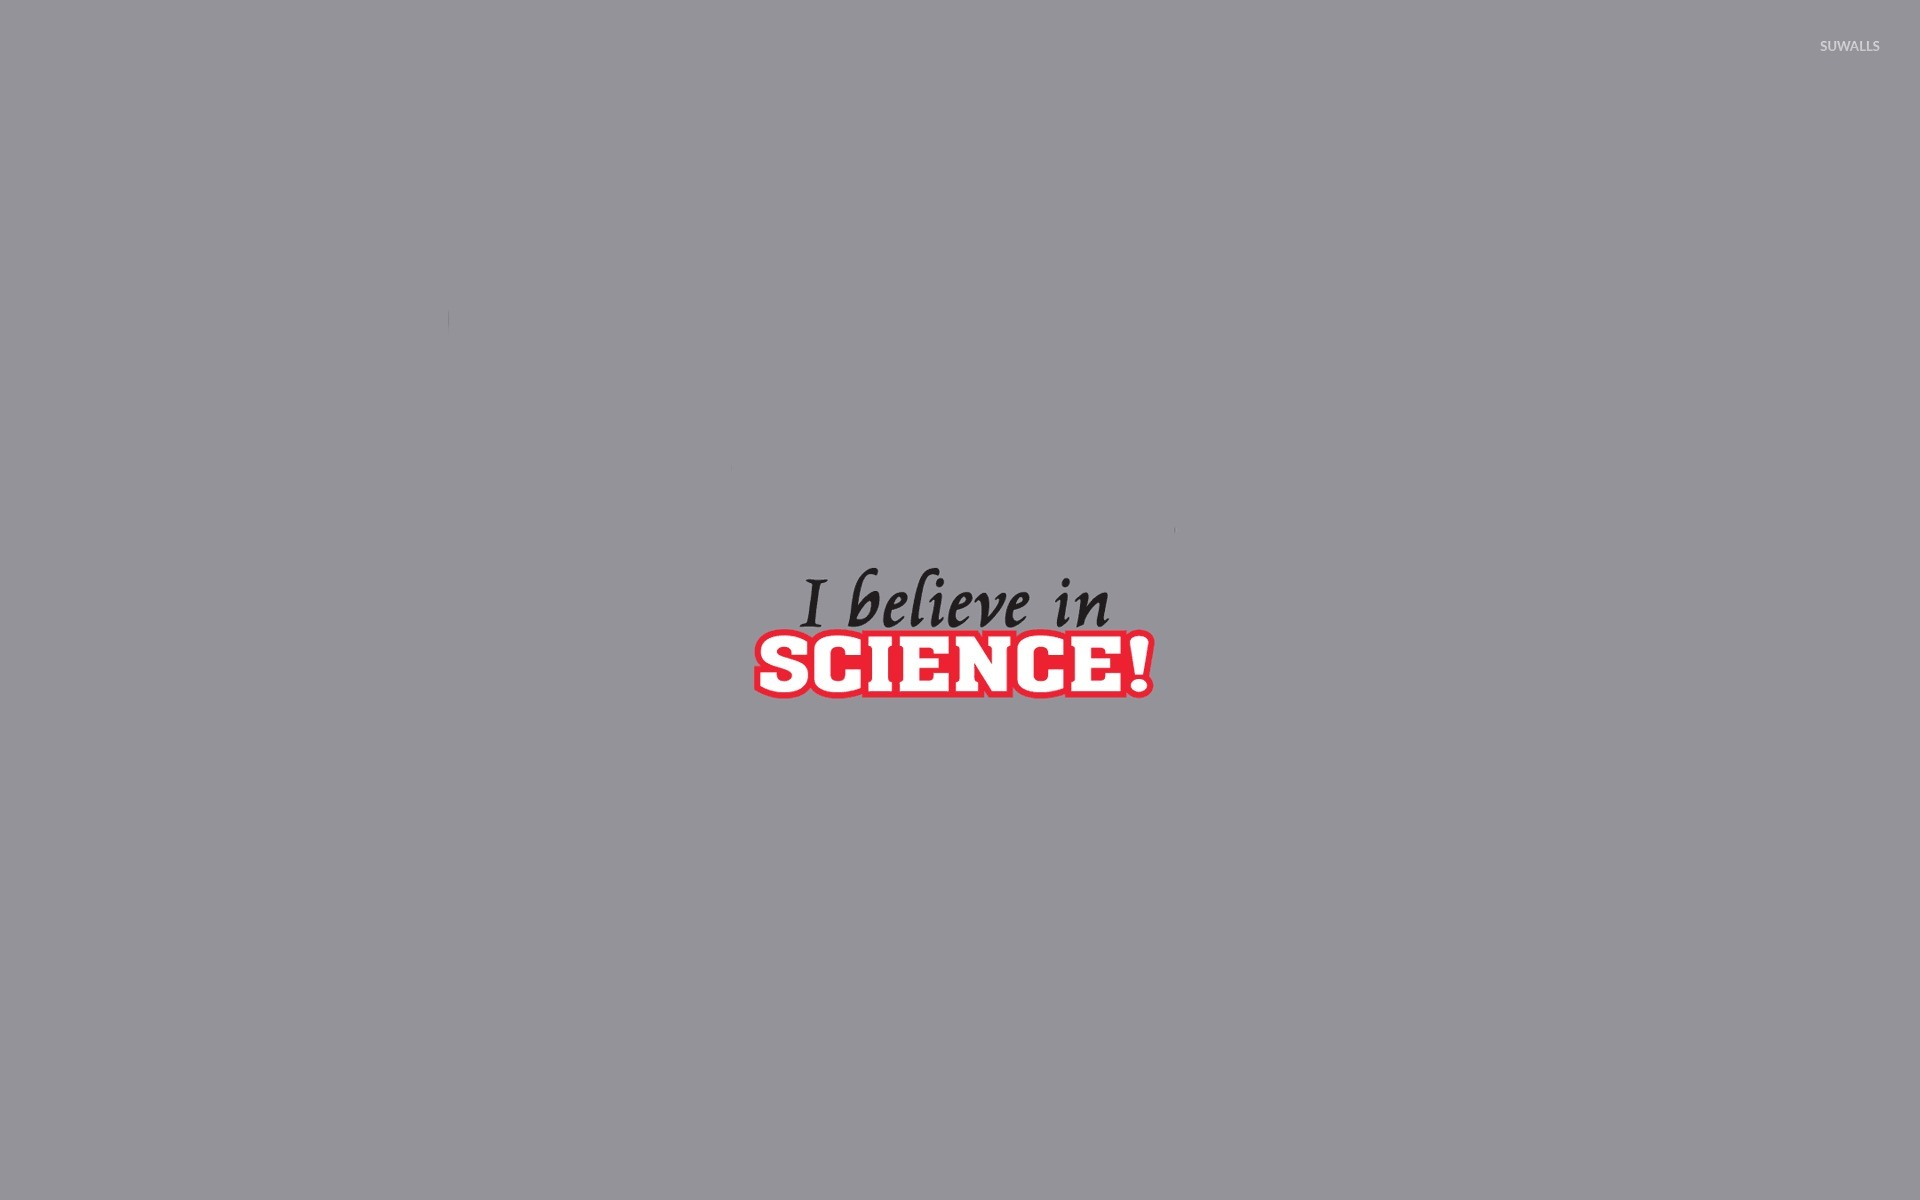 I Believe In Science Wallpaper Typography Wallpapers 27533